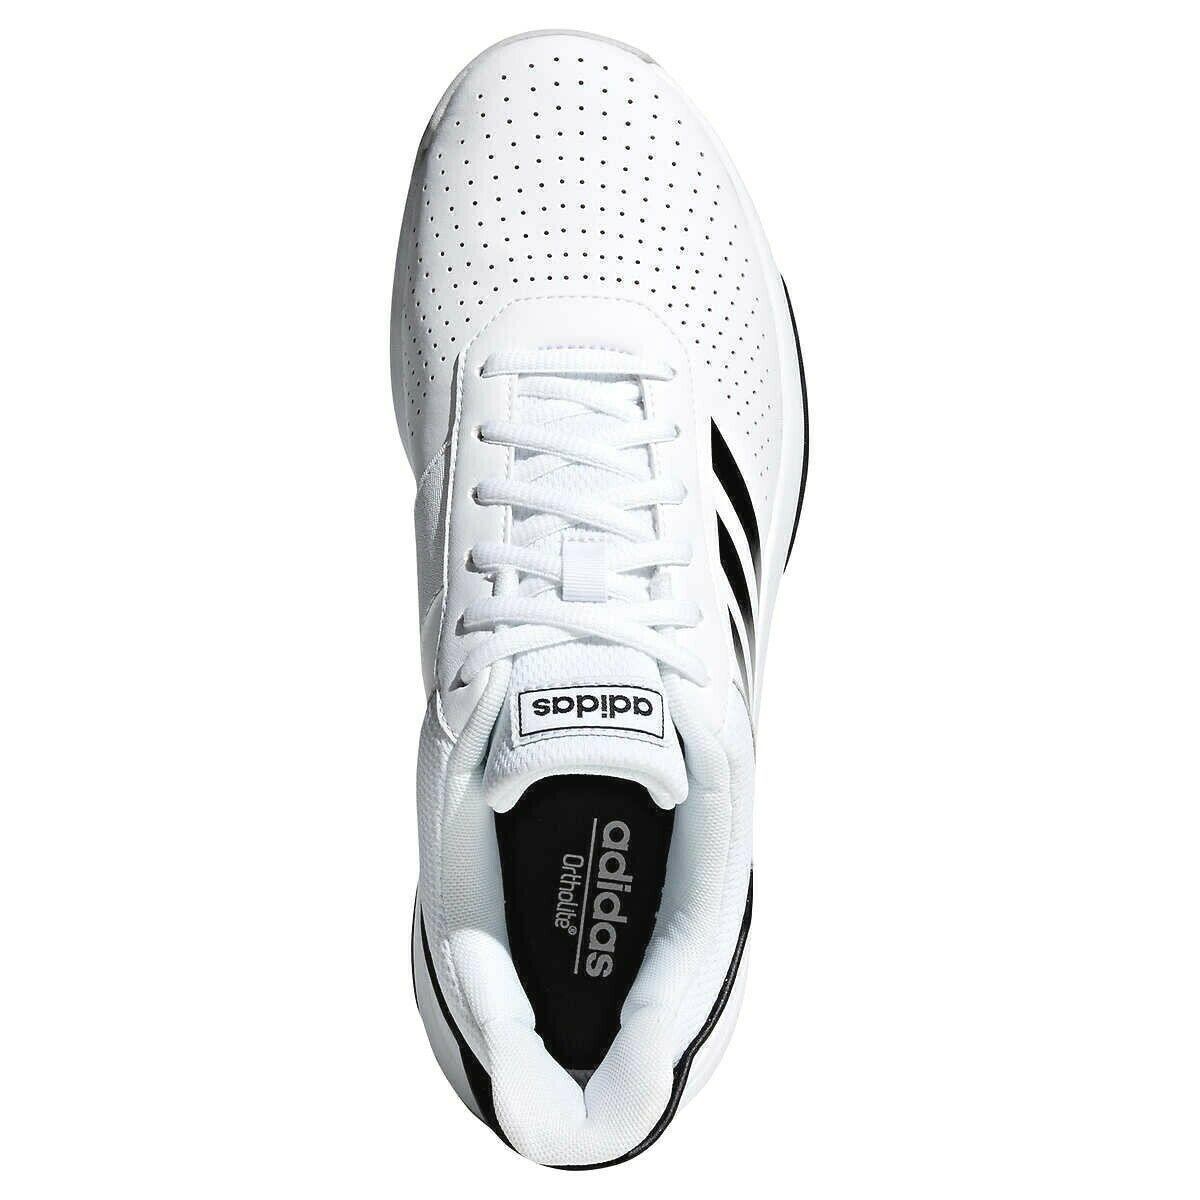 Nuevo Adidas Hombre Blanco / Negro Courtsmash Tribunal Smash Atlético Tenis NWOB image 4